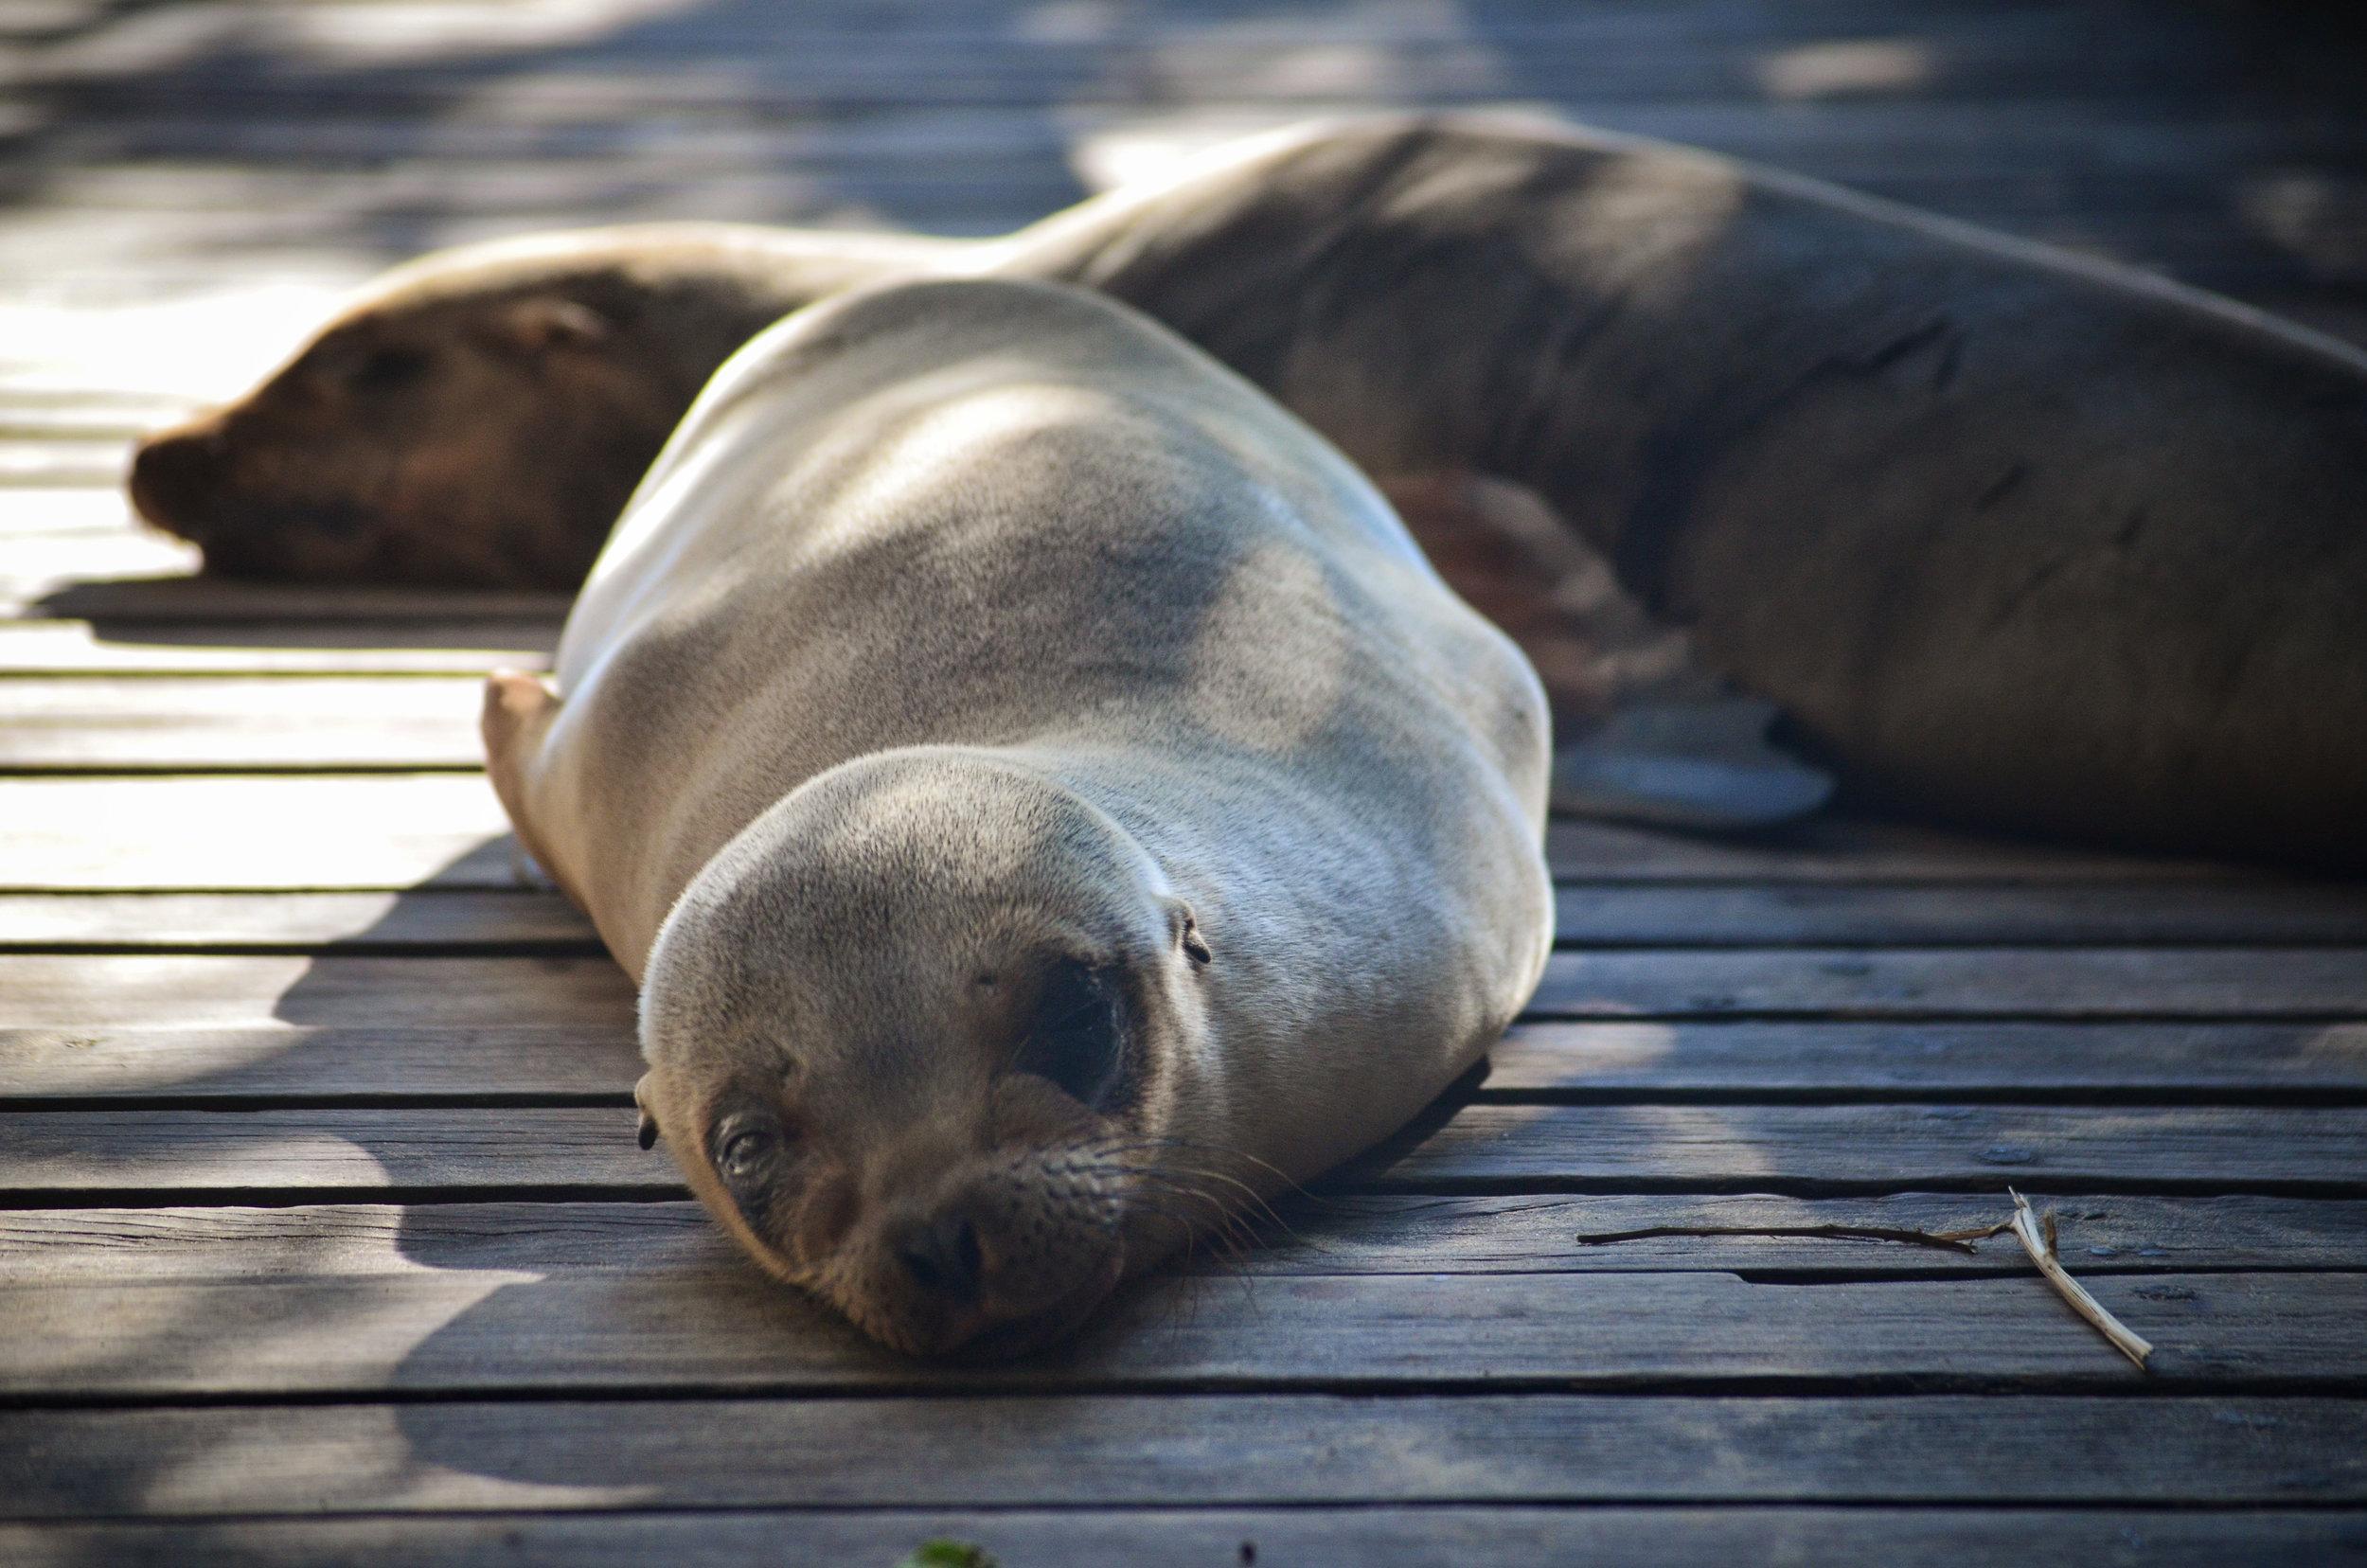 A sleepy sea lion pup naps with mama on the dock